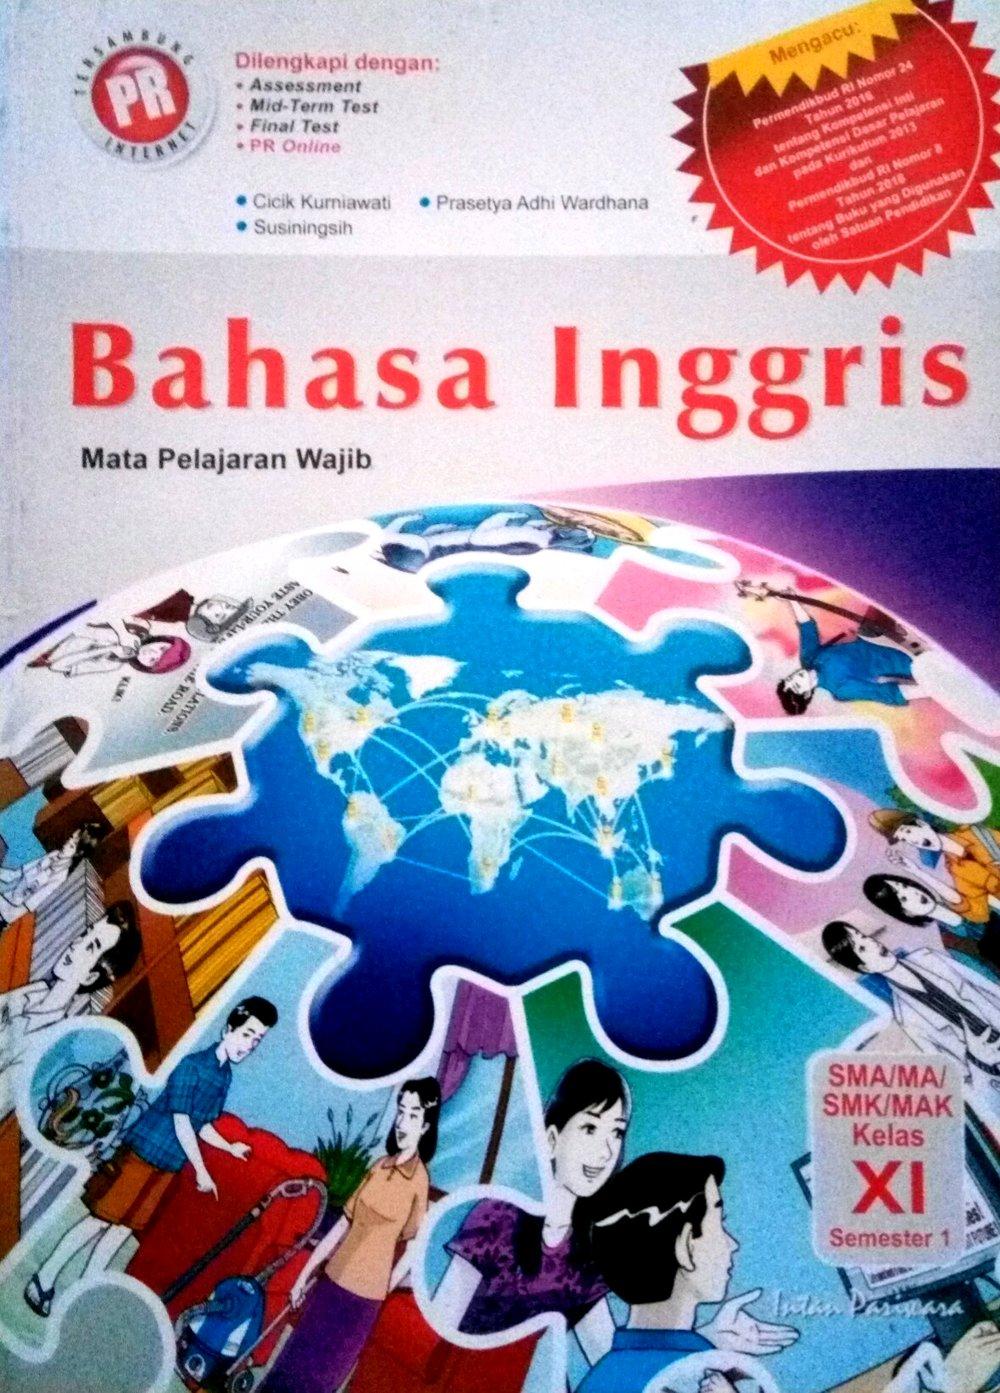 Kunci Jawaban Buku Bright An English Kelas 9 Kurikulum 2013 Revisi 2021 Bright Jl 3 English Course For Junior High School K13n Kunci Jawaban Buku Tematik Kelas 5 Tema 9